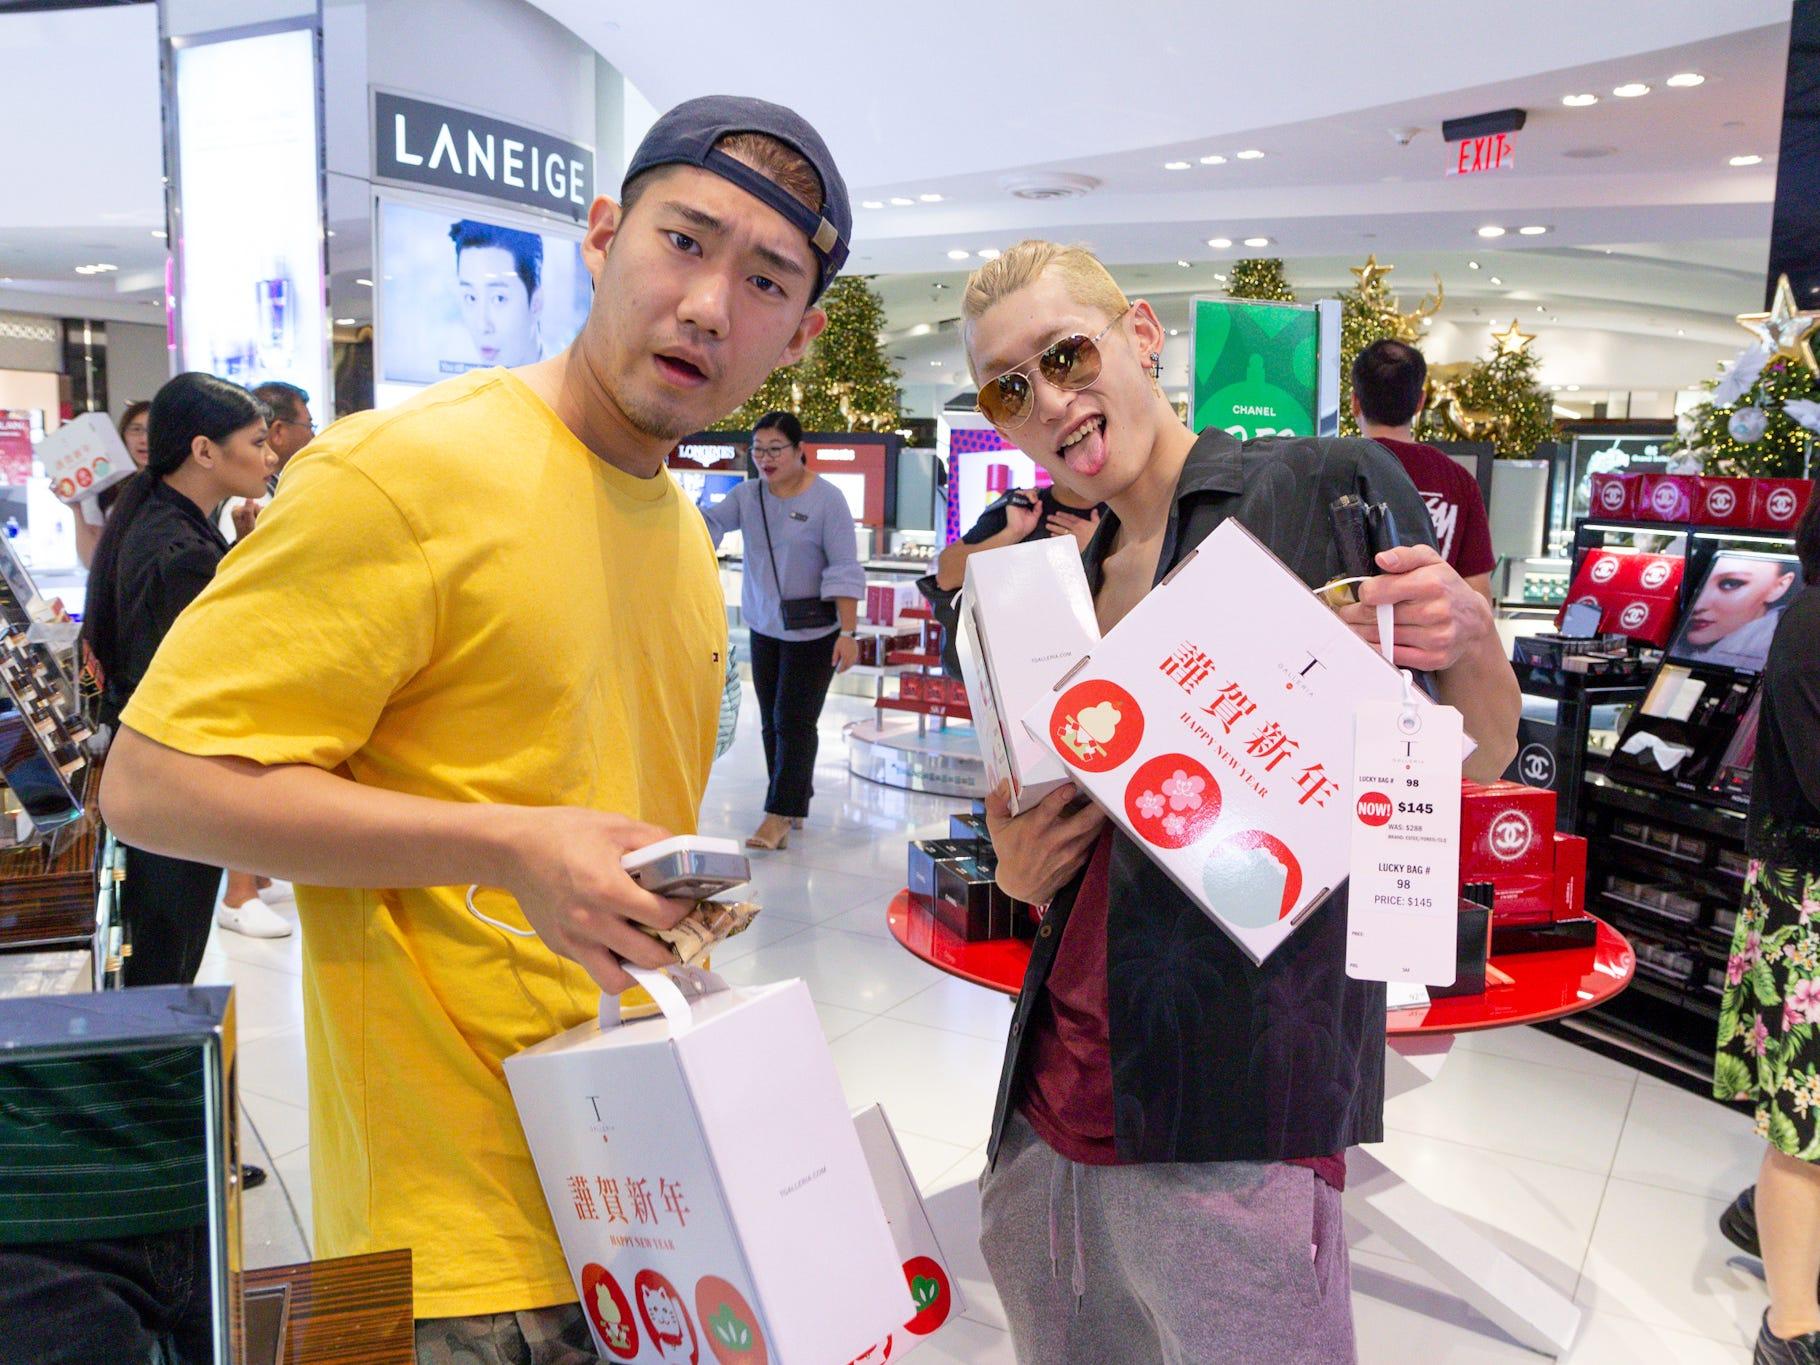 Fukubukuro shopping experience held at DFS Galleria New Year's morning.